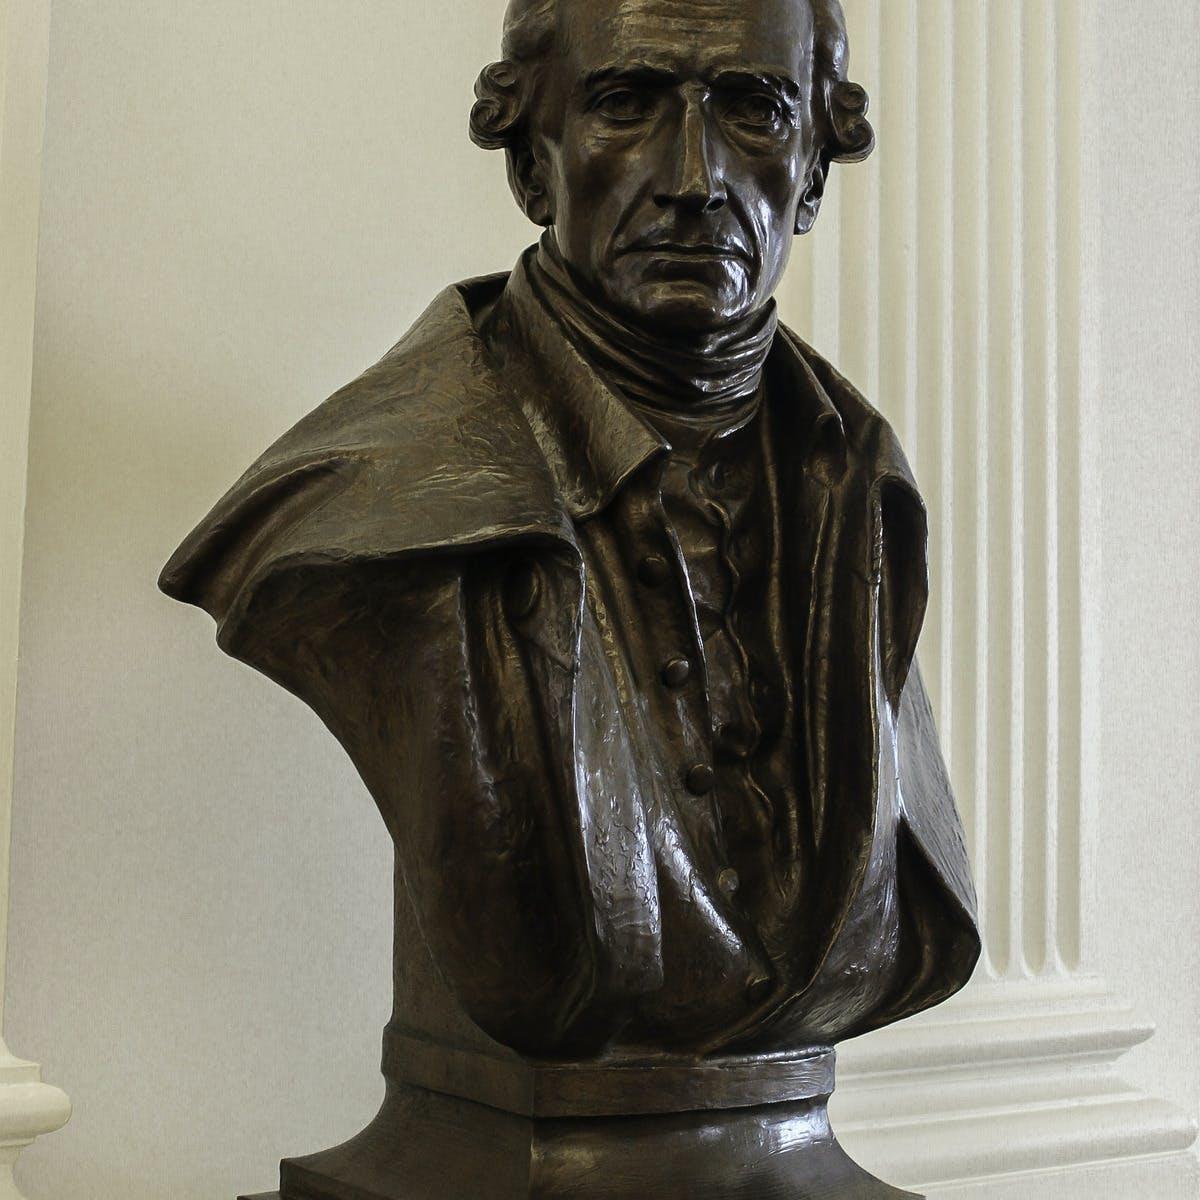 Patrick Henry: Forgotten Founder